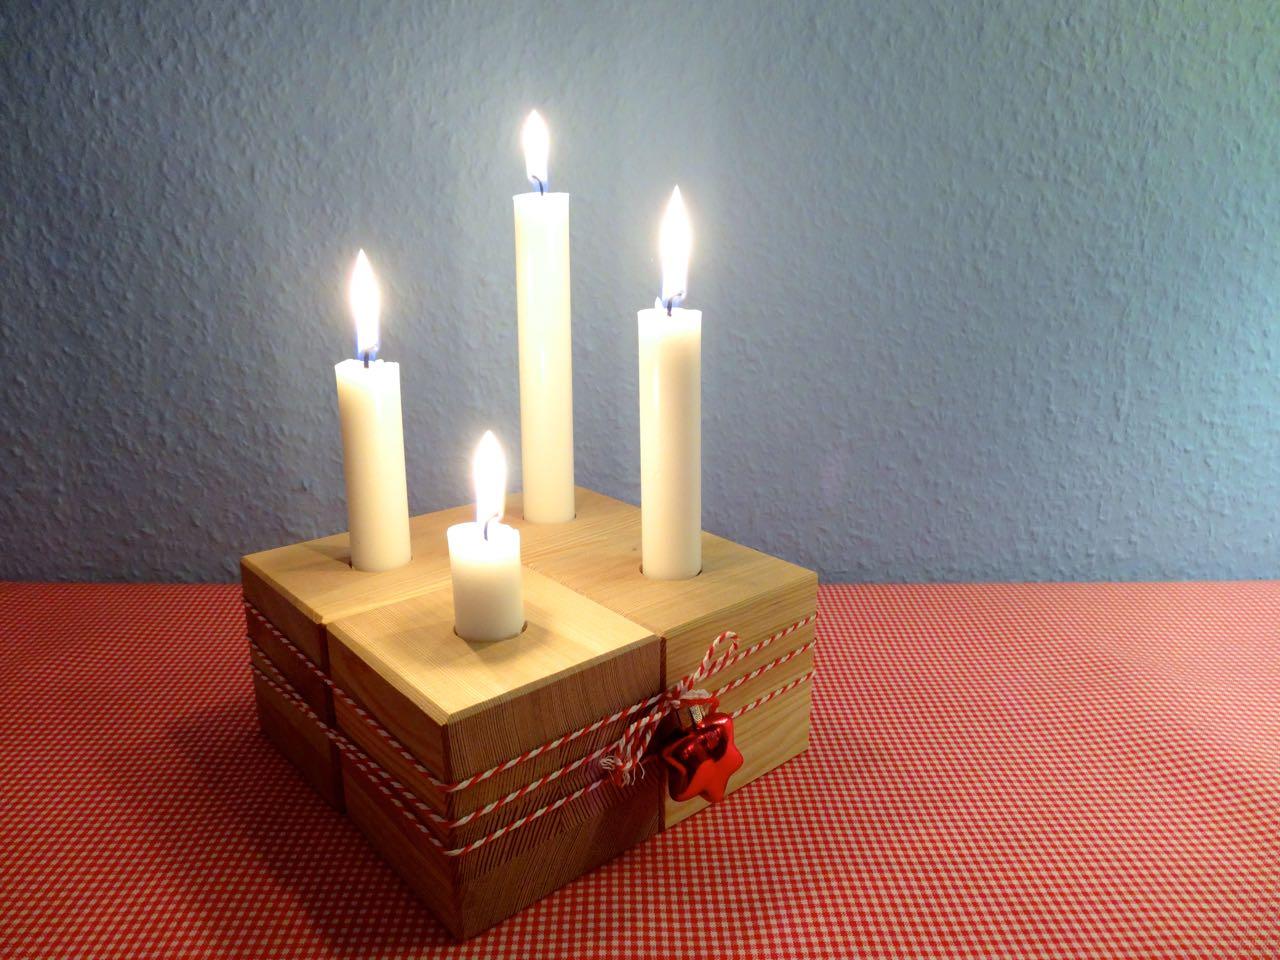 frische brise 4 advent. Black Bedroom Furniture Sets. Home Design Ideas